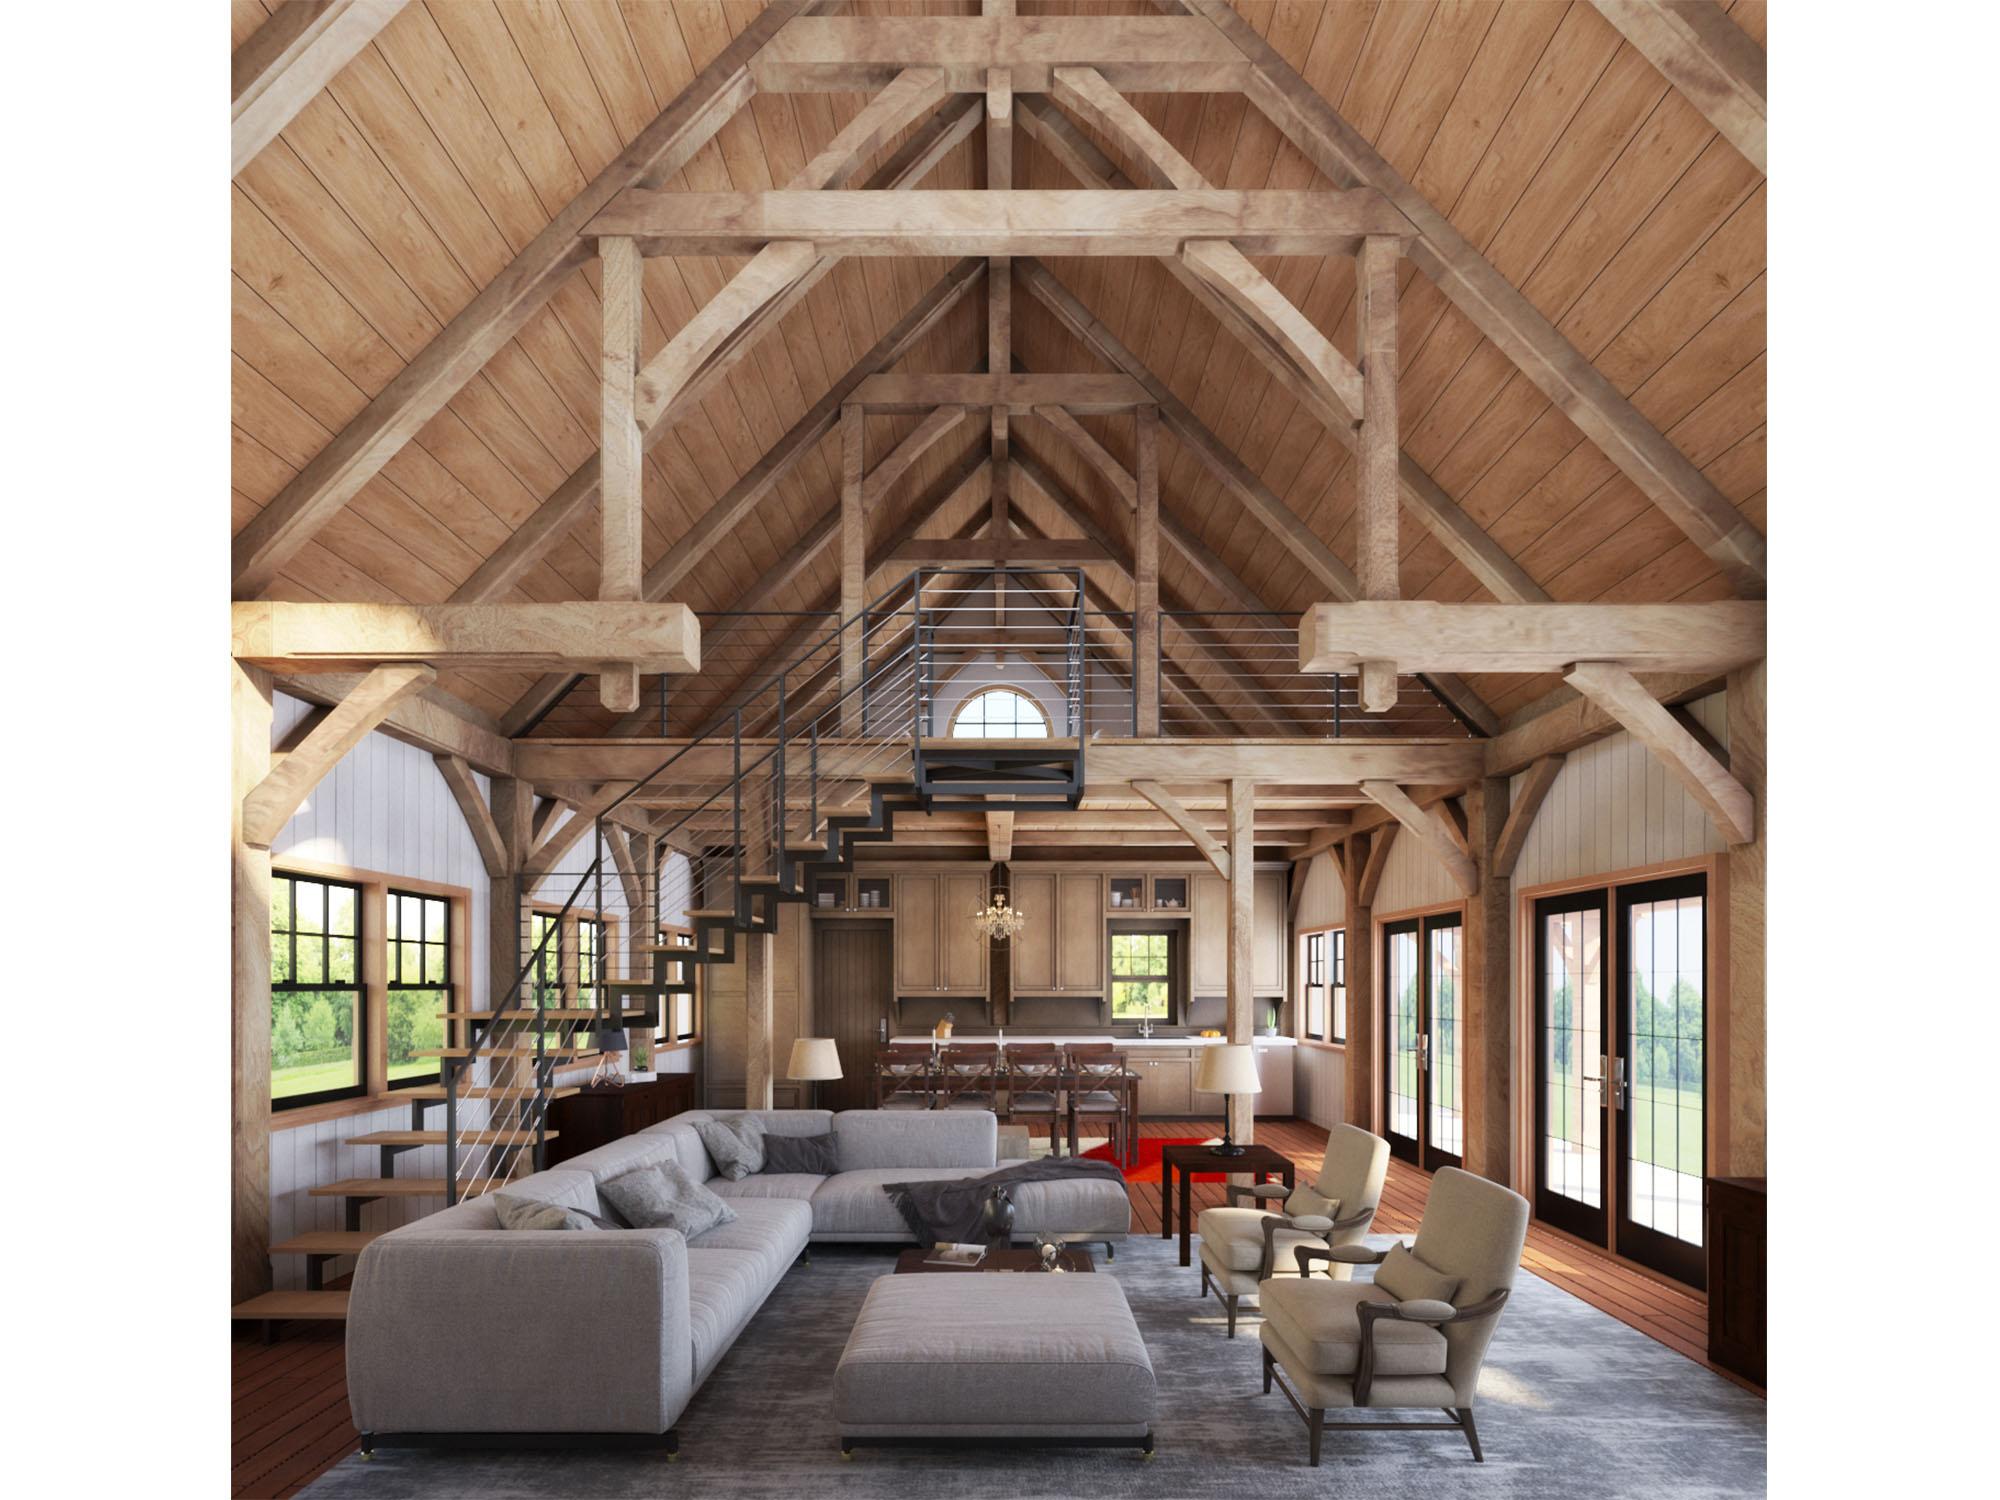 Rustic Barn House